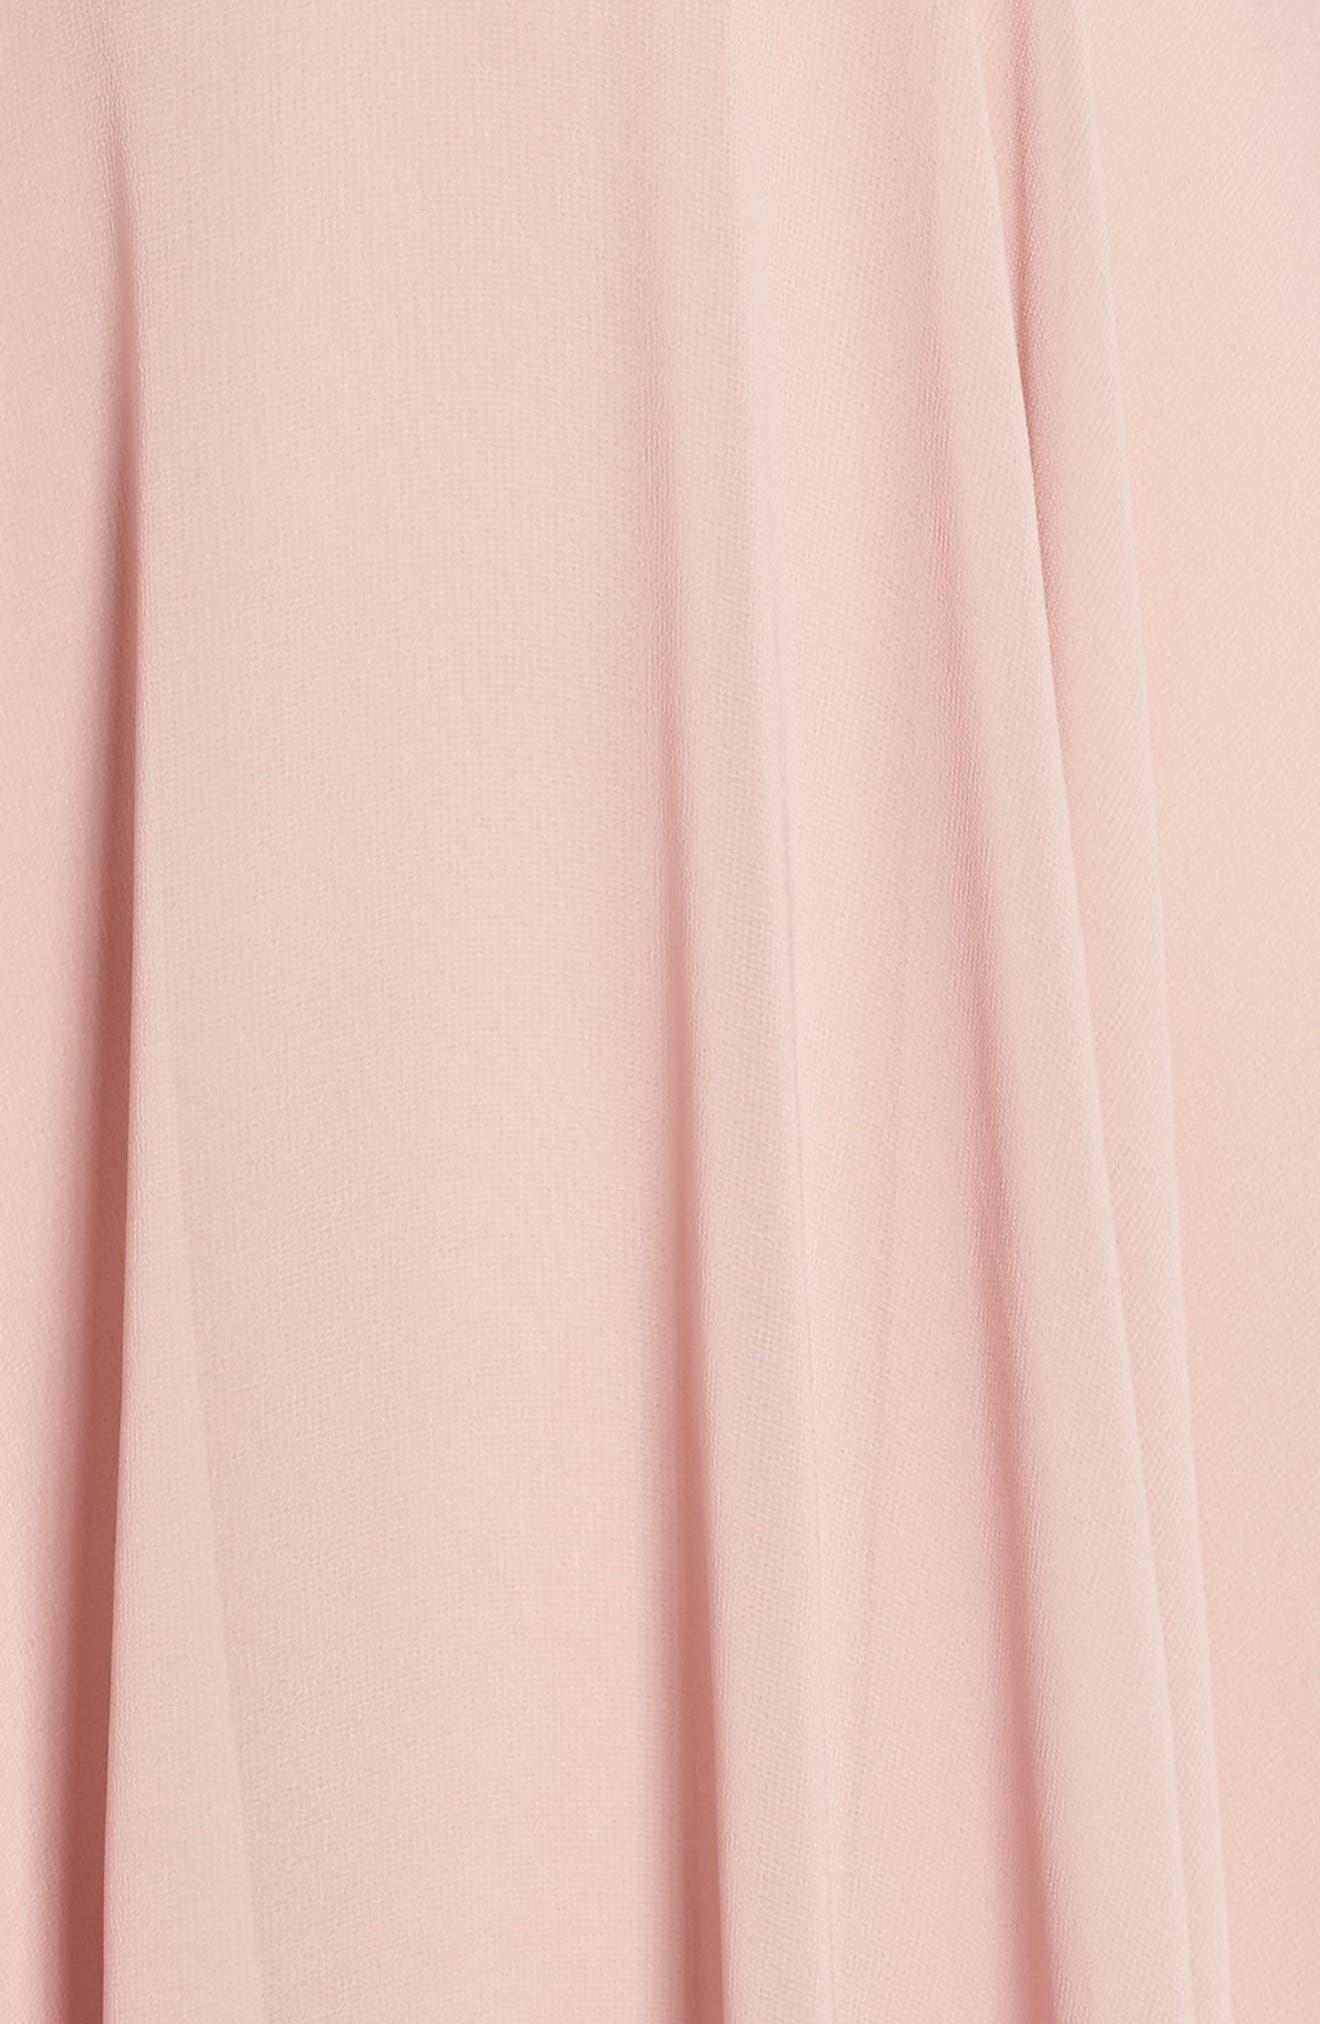 Kelli Cold Shoulder Chiffon Dress,                             Alternate thumbnail 5, color,                             664